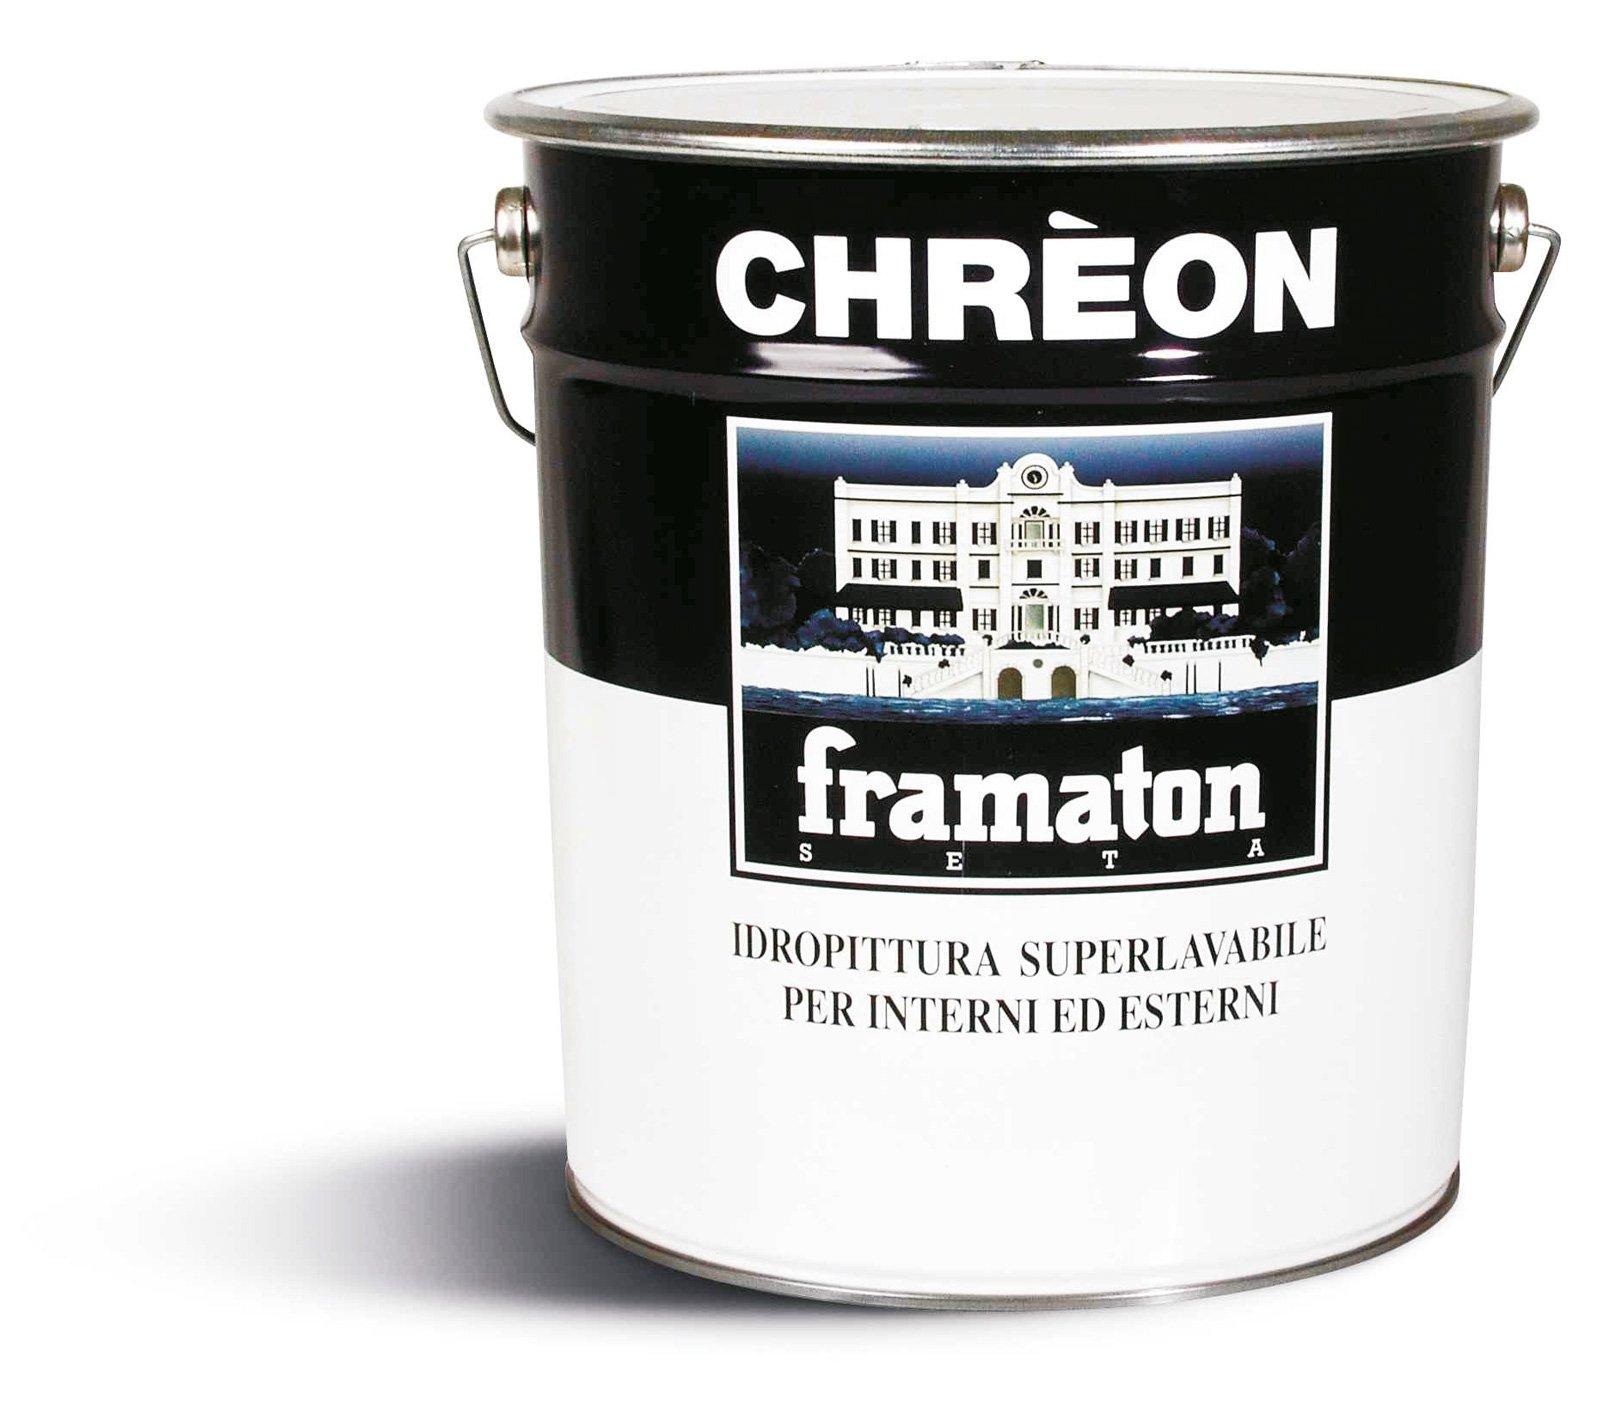 Chreon framaton - Dispositivo arresto motori lombardini